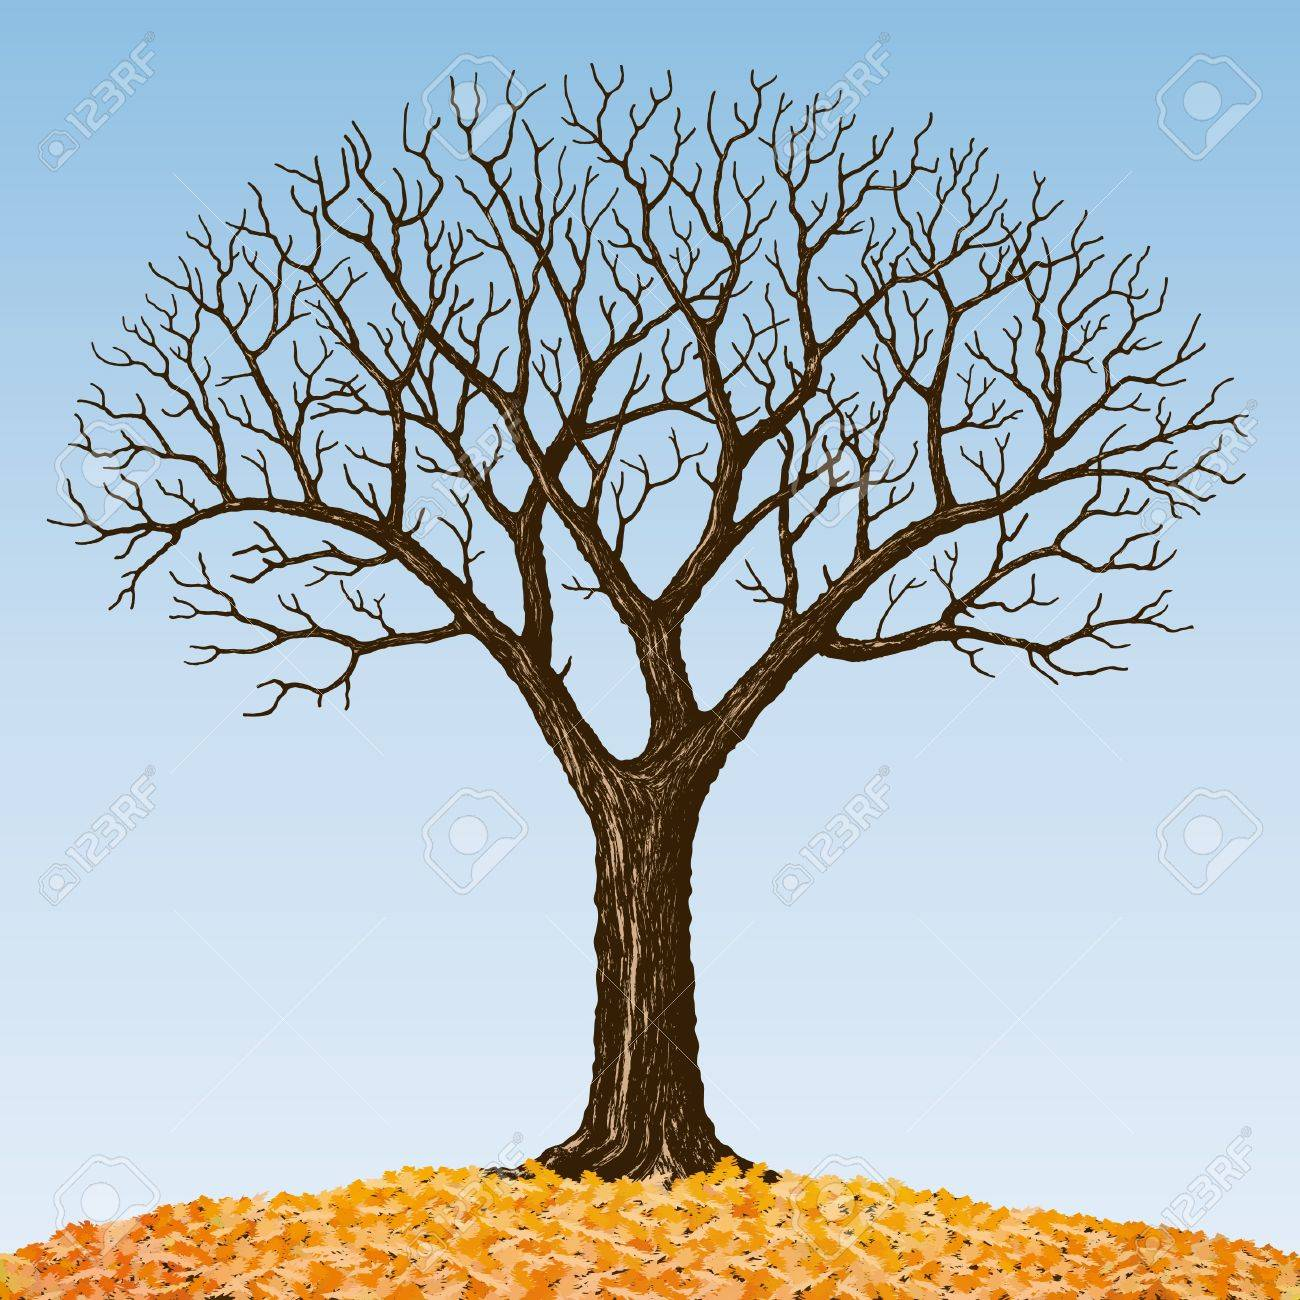 Bare tree - 10526522